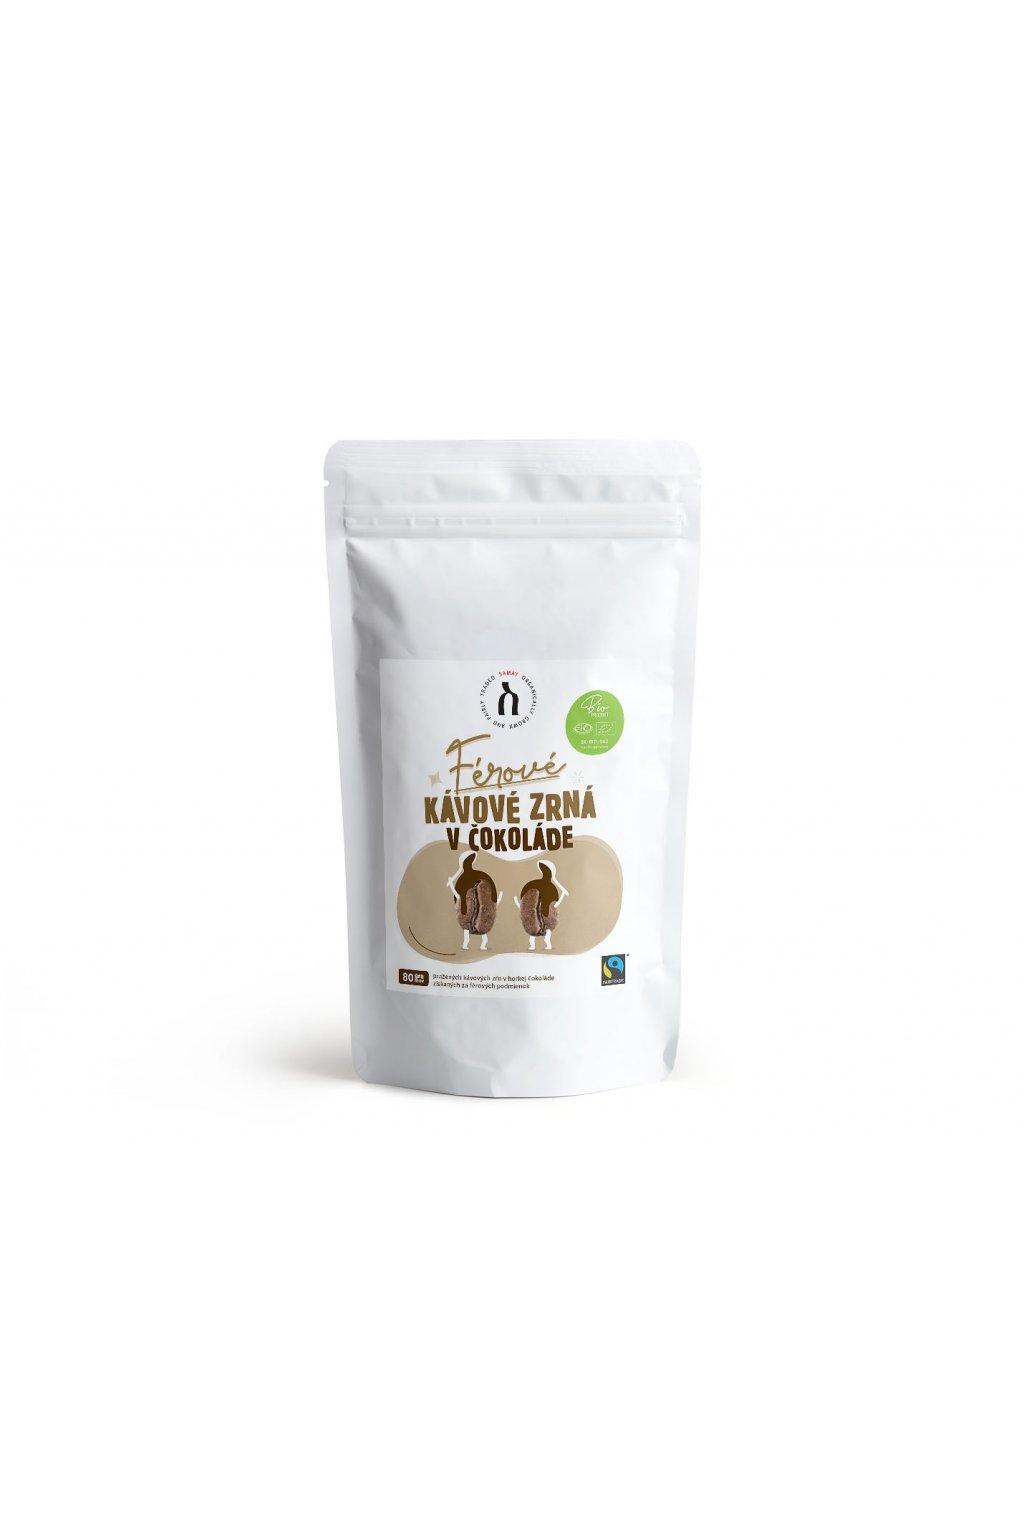 SAMAY Kavove zrna v cokolade Fairtrade BIO 80g